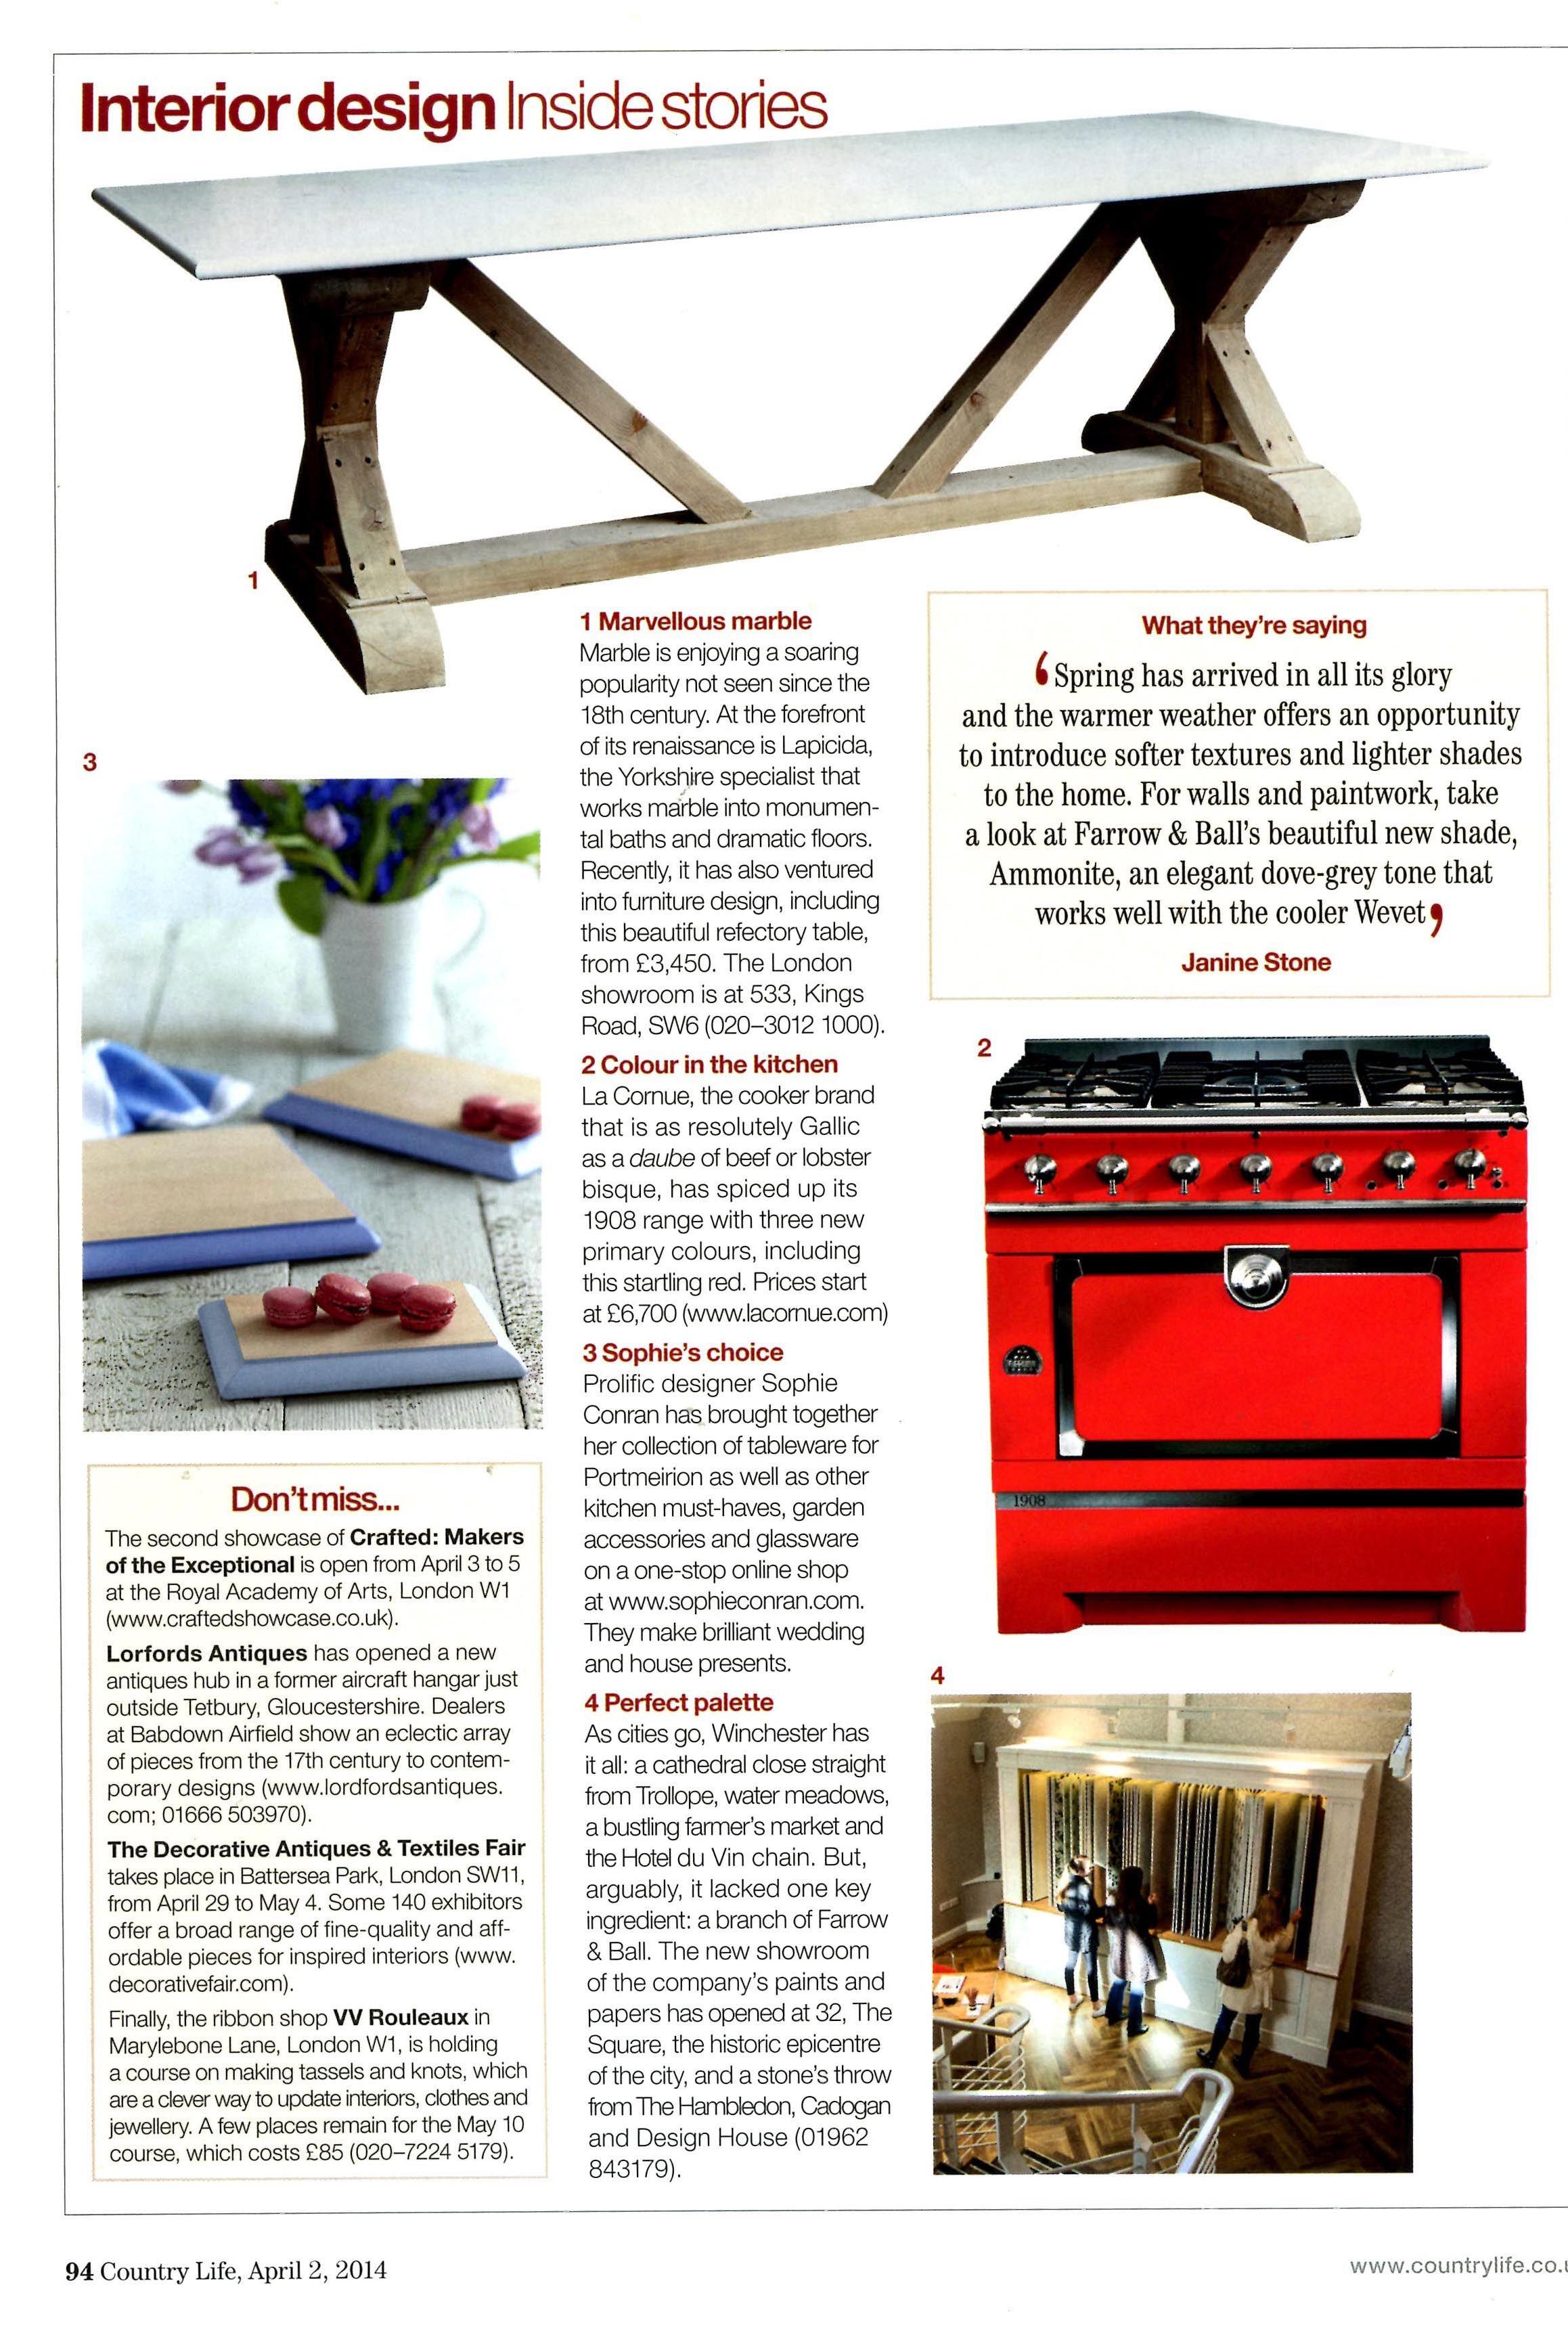 Colour in the kitchen: La Cornue 1908 range cooker in primary red www.lacornue.com/en Country Life April 2nd 2014